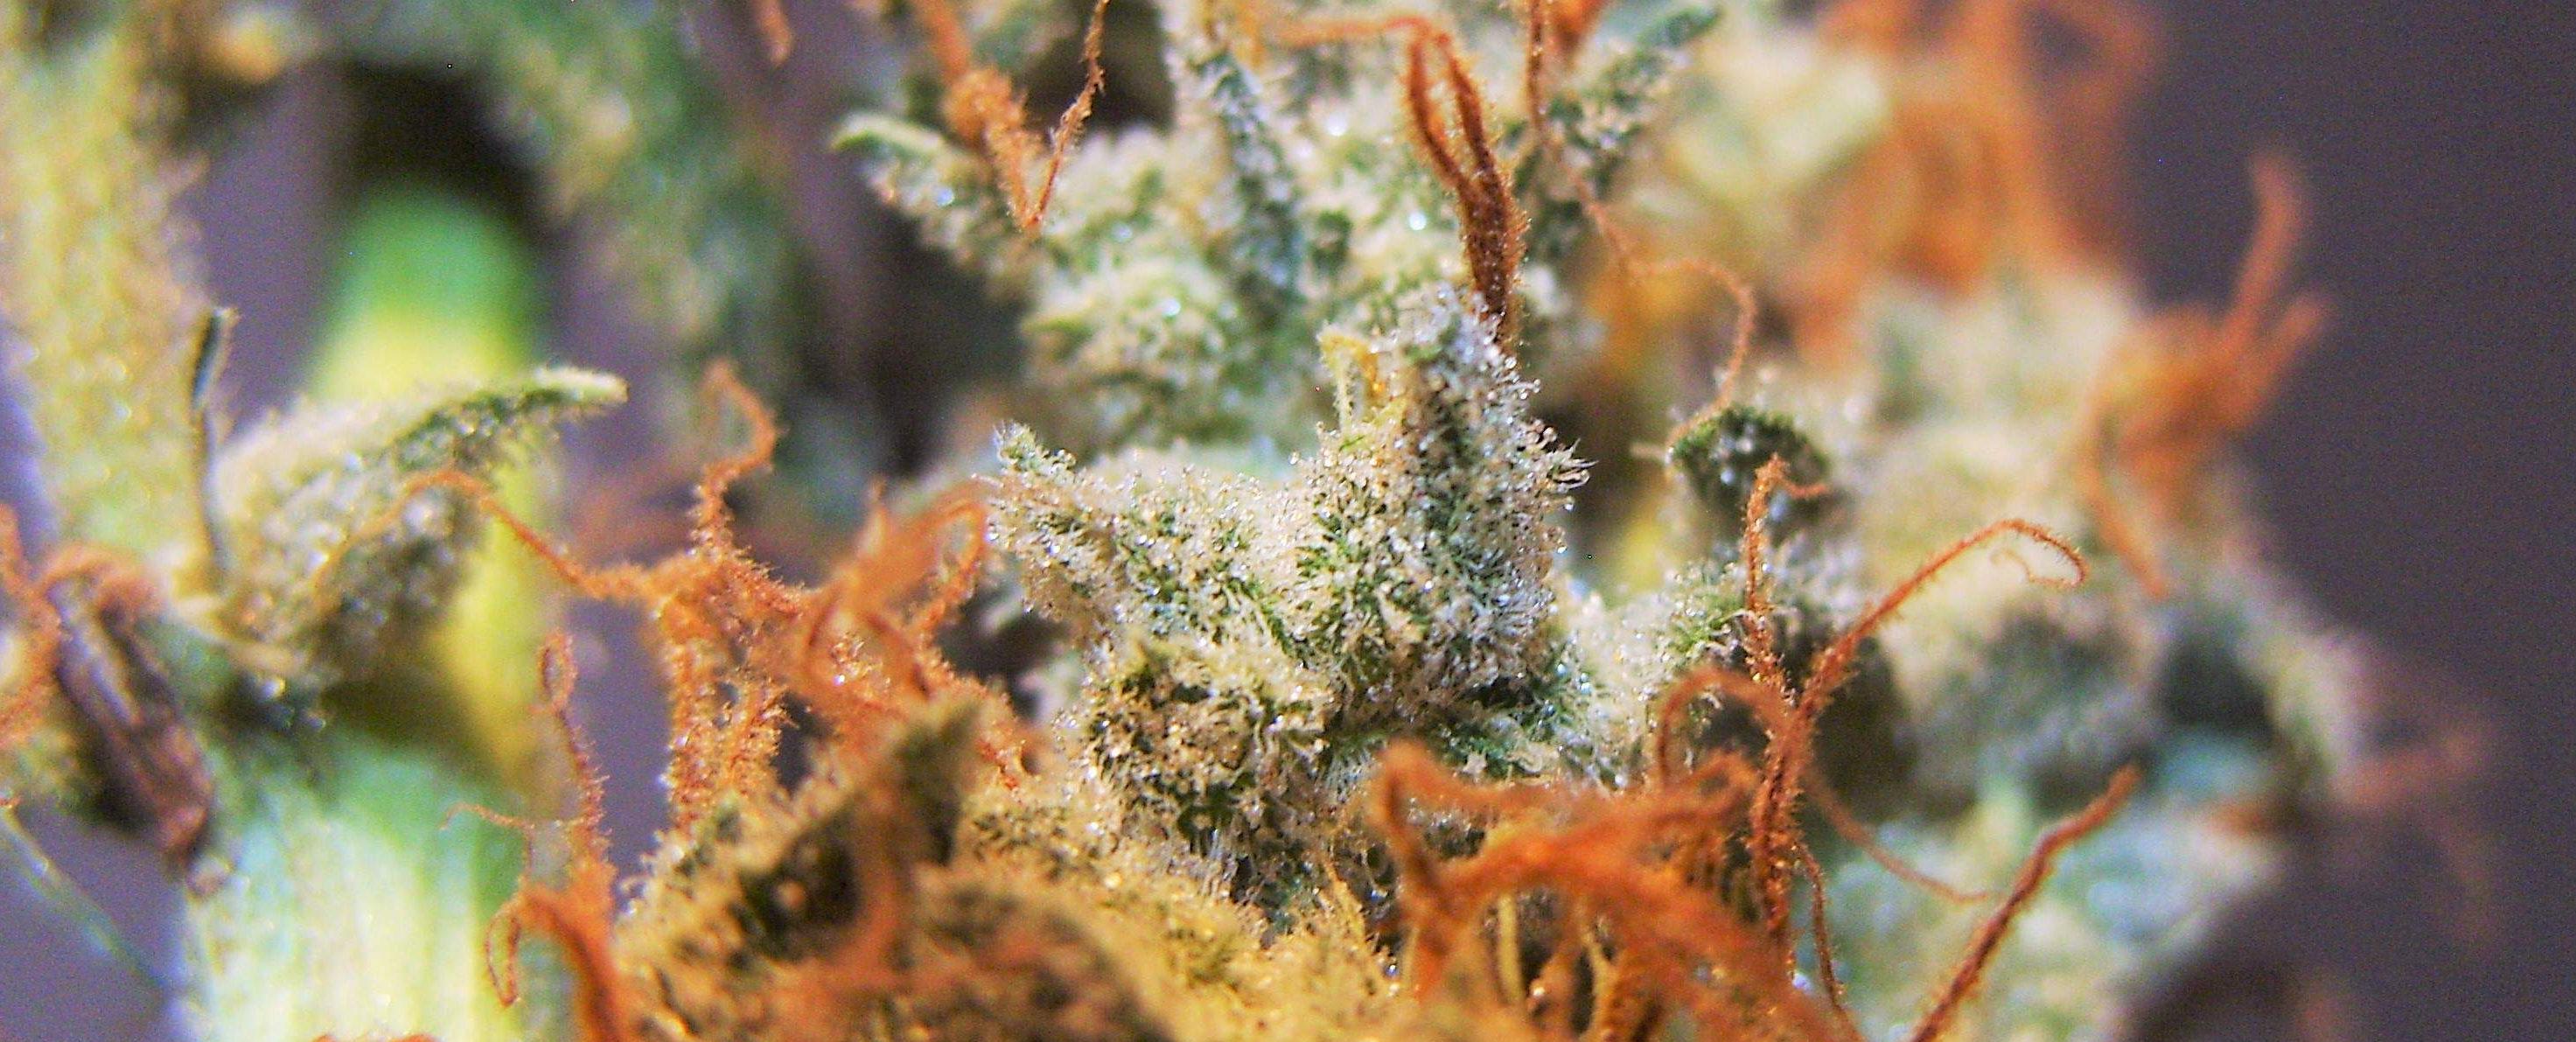 How to Grow Autoflowering Marijuana Seeds - Auto Seeds